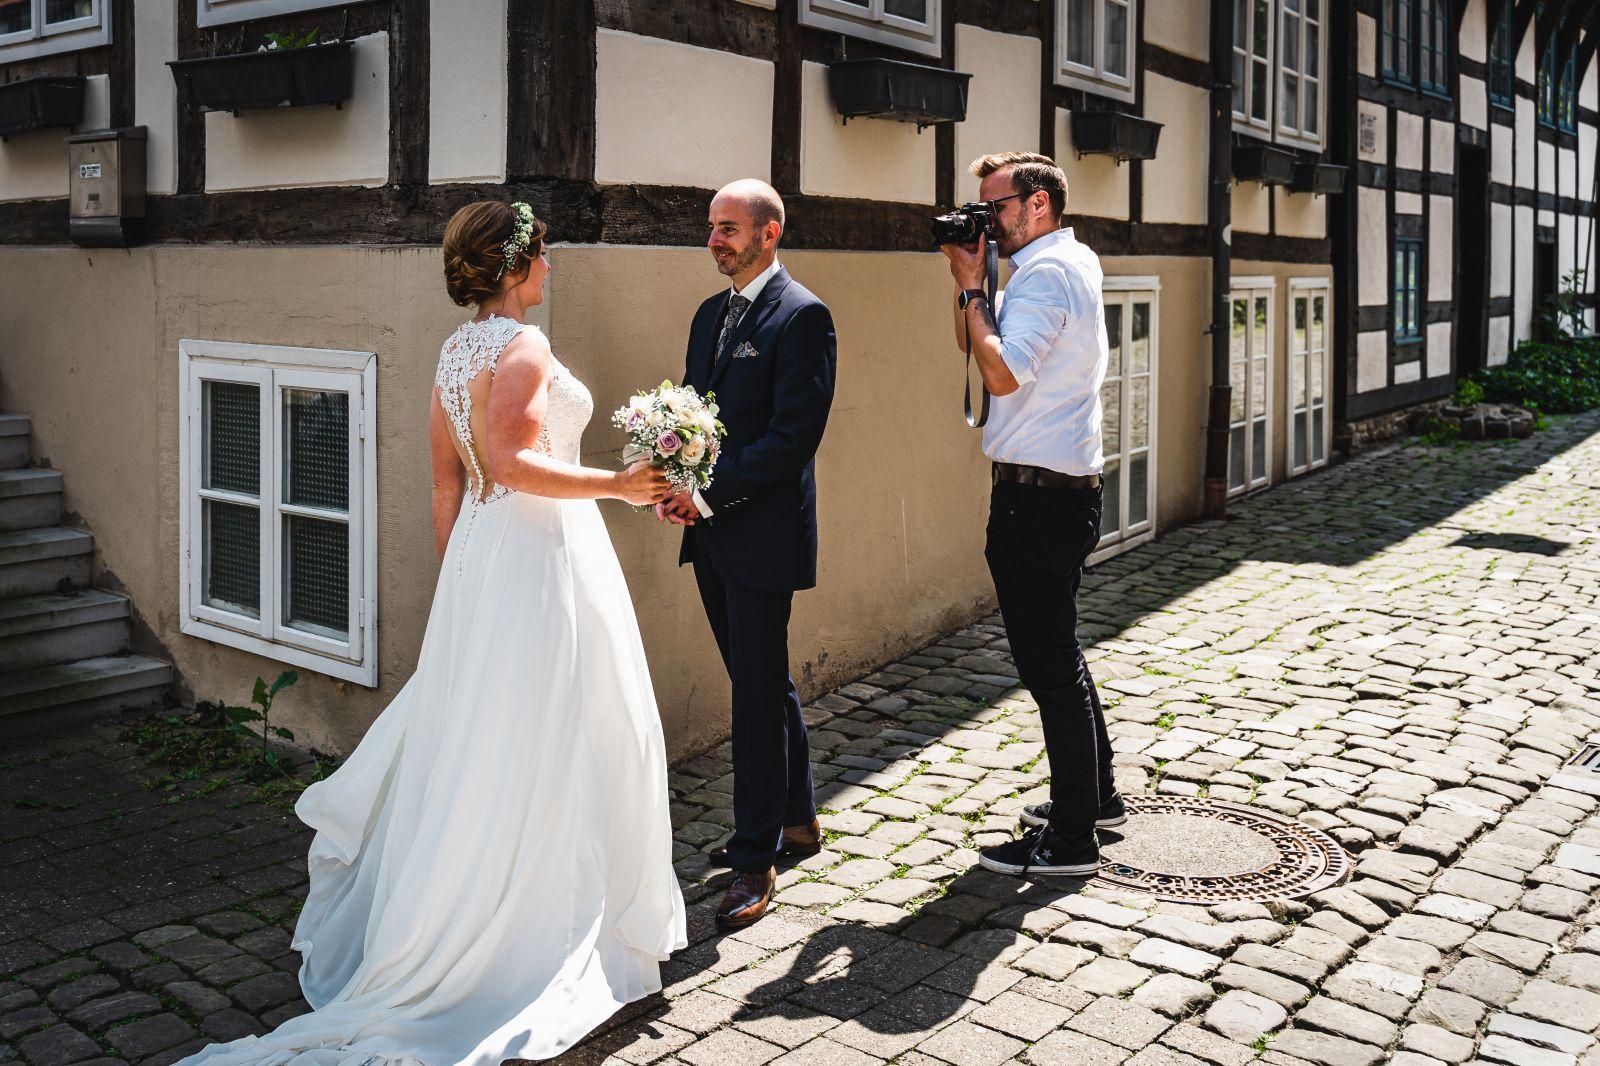 Hochzeitsfotograf, OWL,Hochzeitsfotograf, Bielefeld, Hochzeitsfotograf, Paderborn